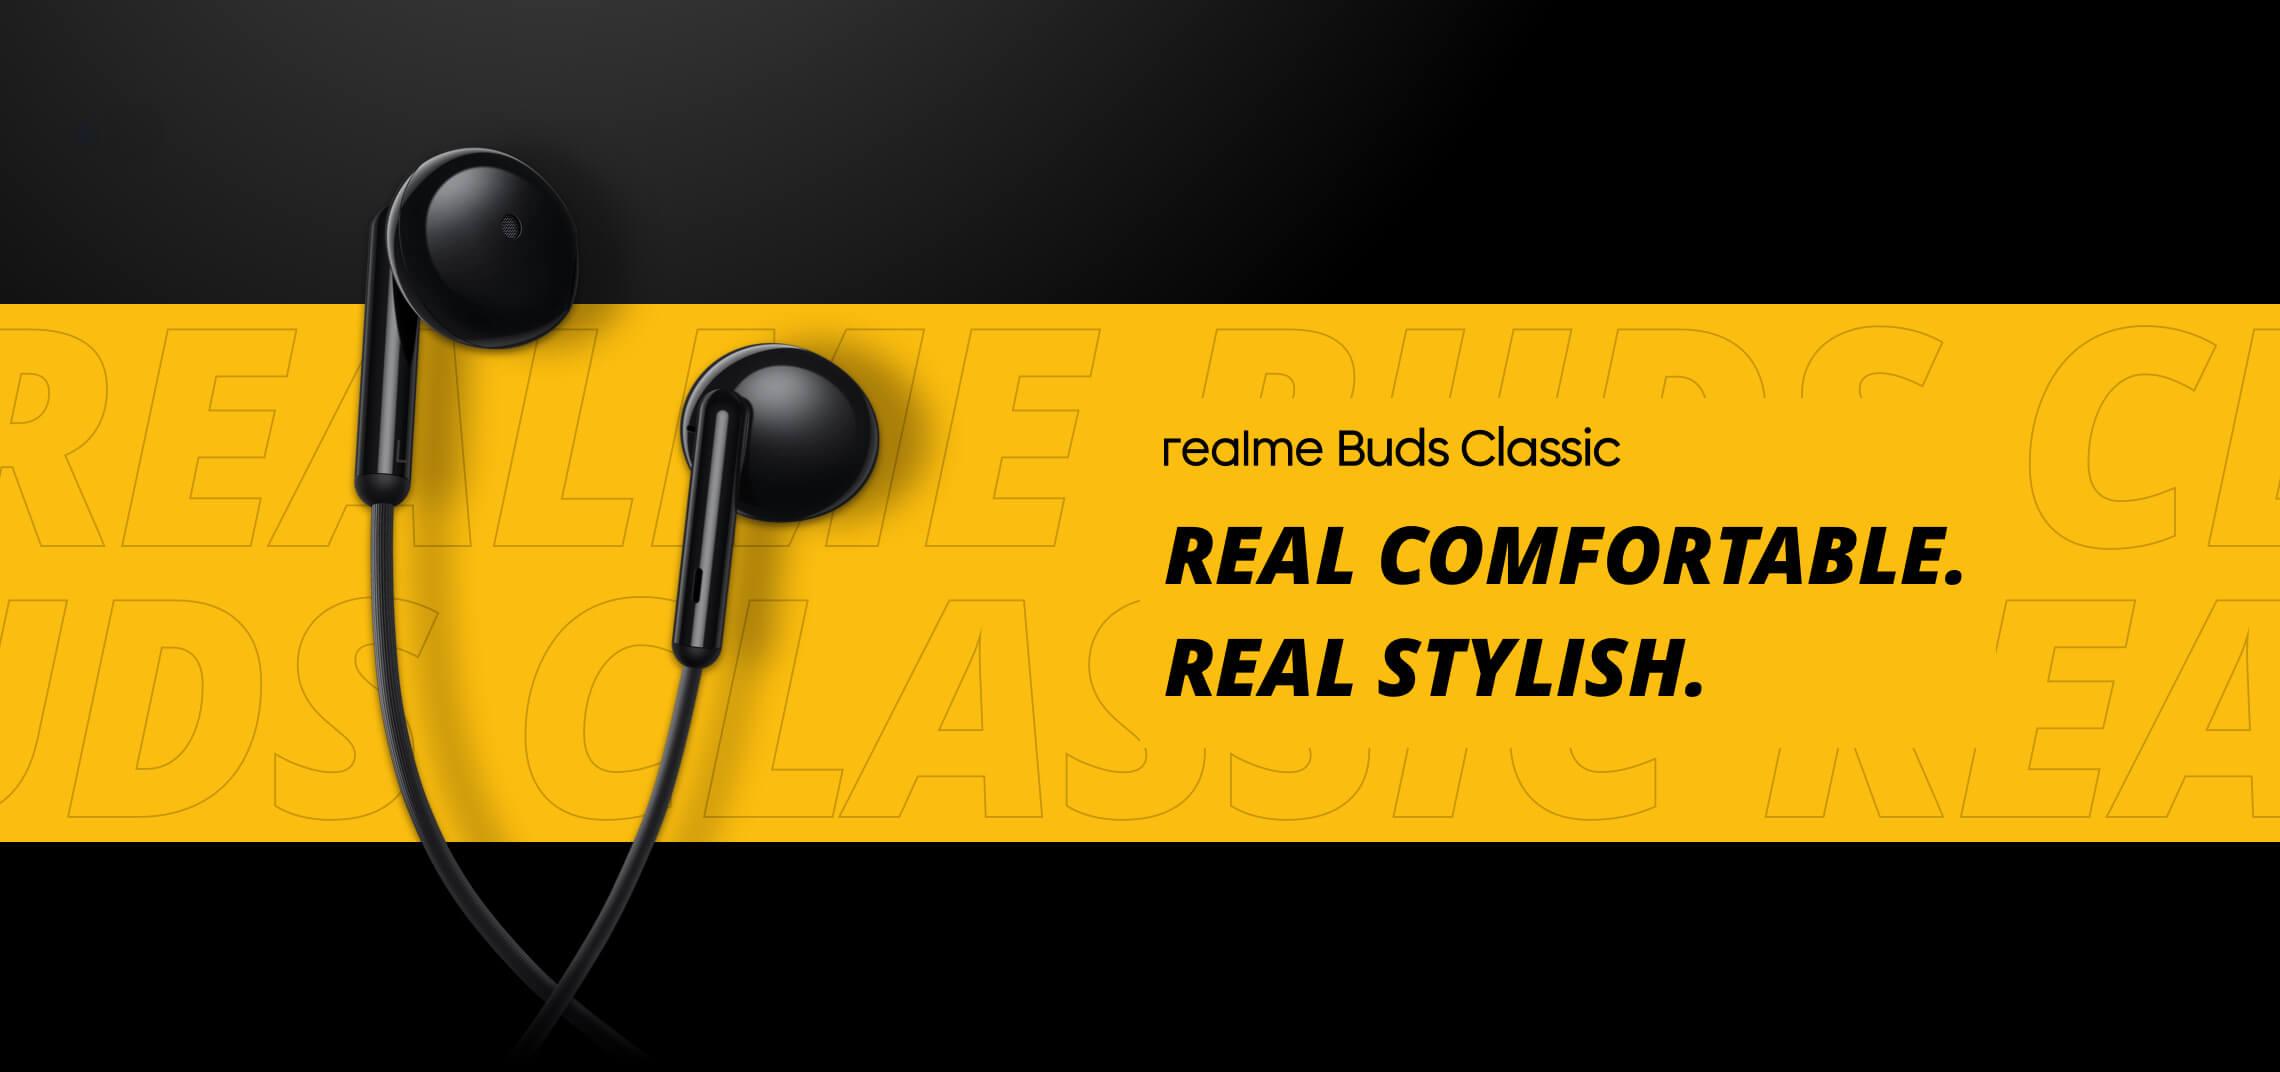 Realme Buds Classic Earphones